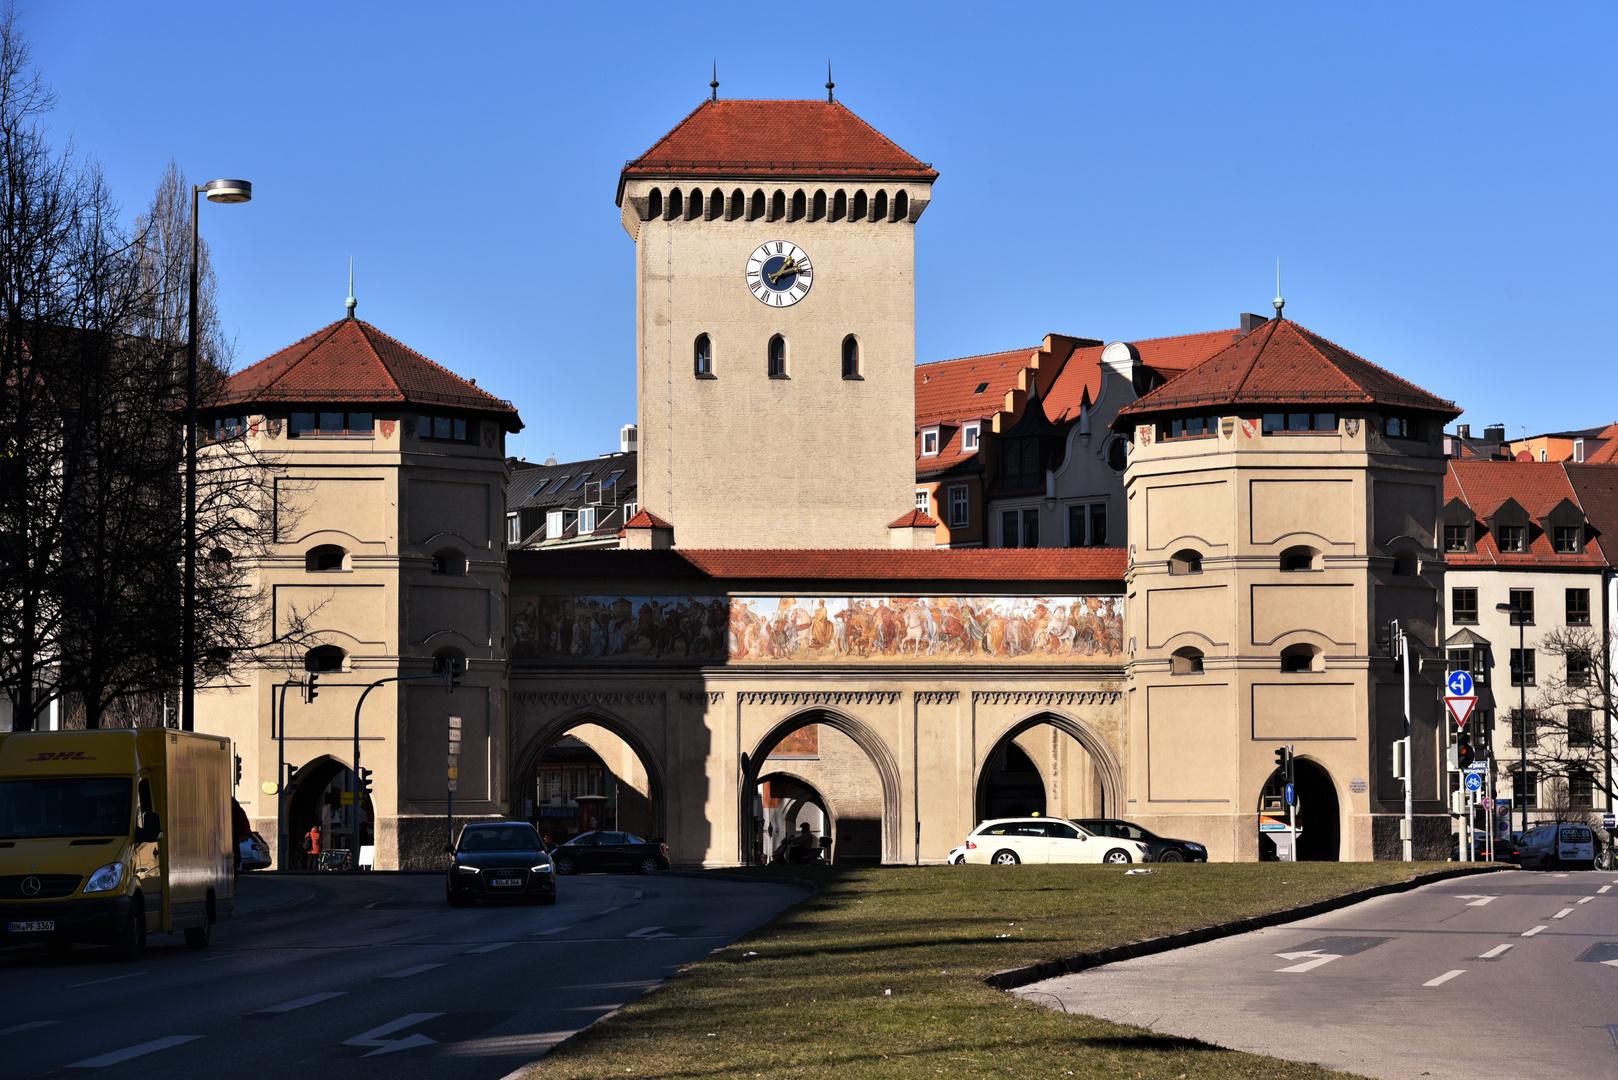 Isartor Munich